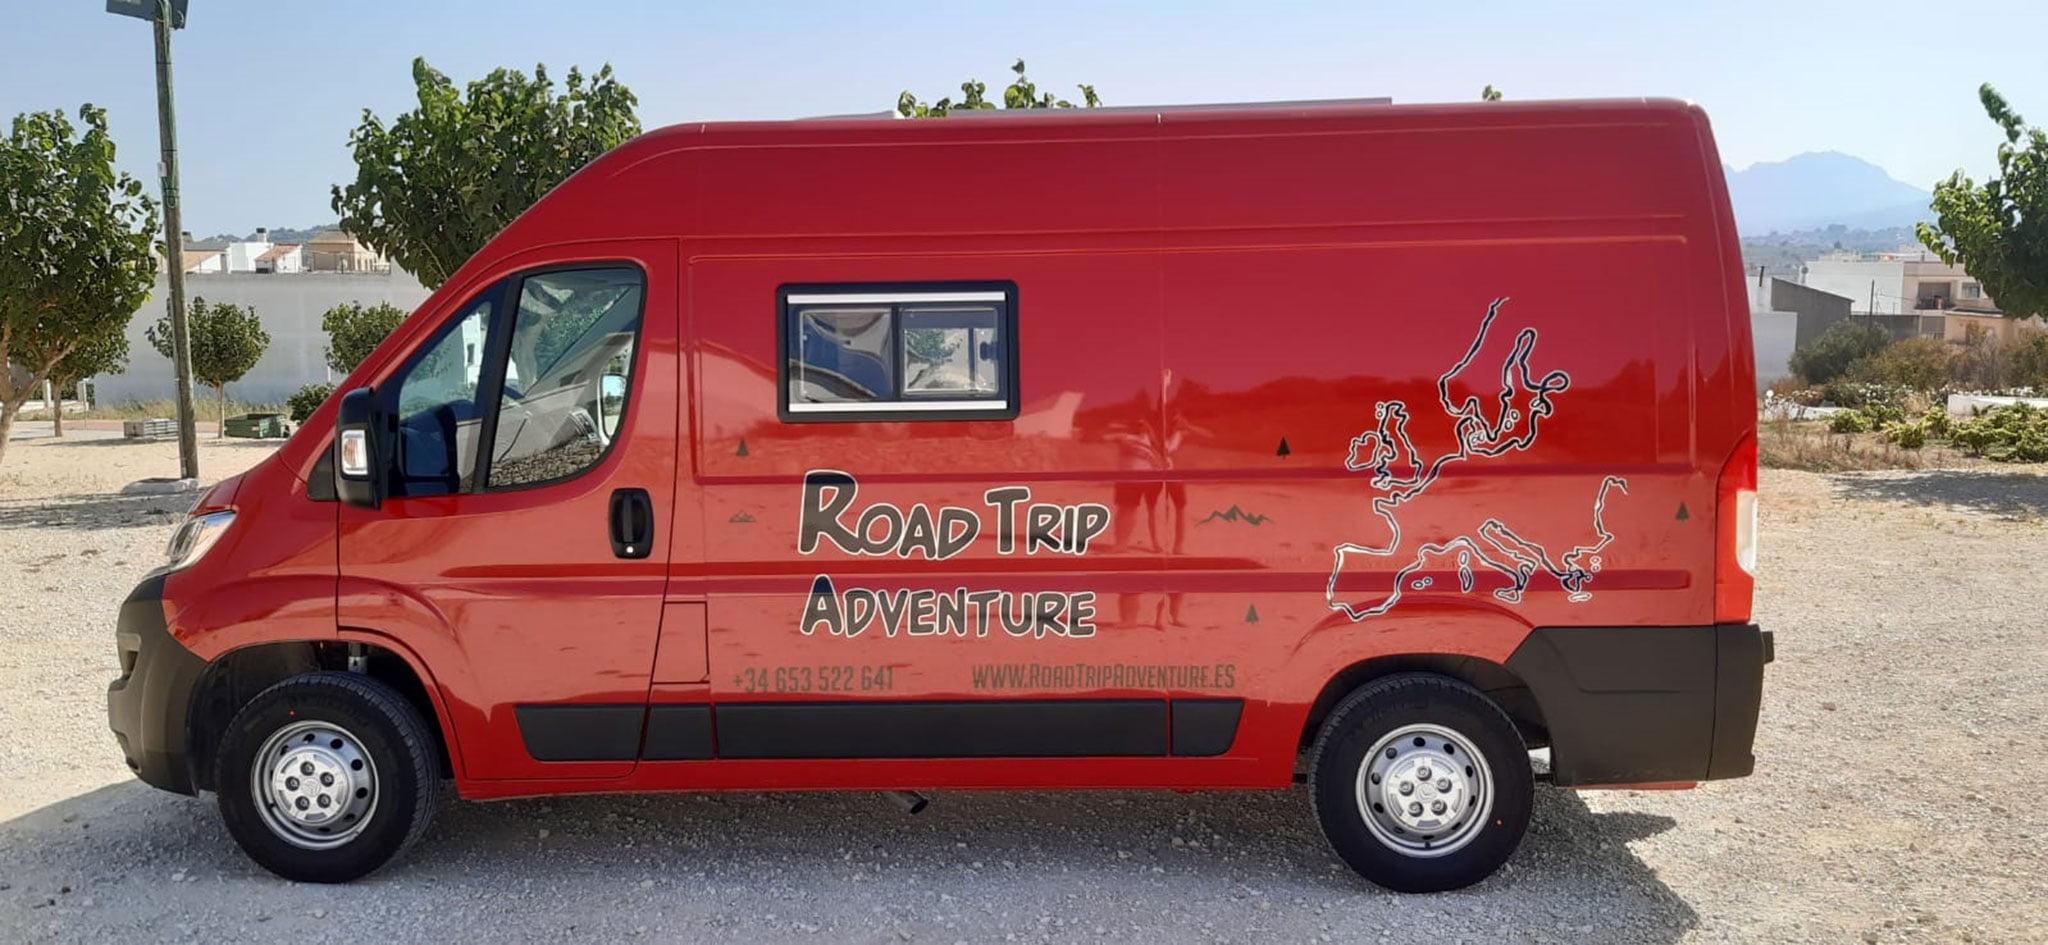 Vista de la nueva furgoneta de Road Trip Adventure